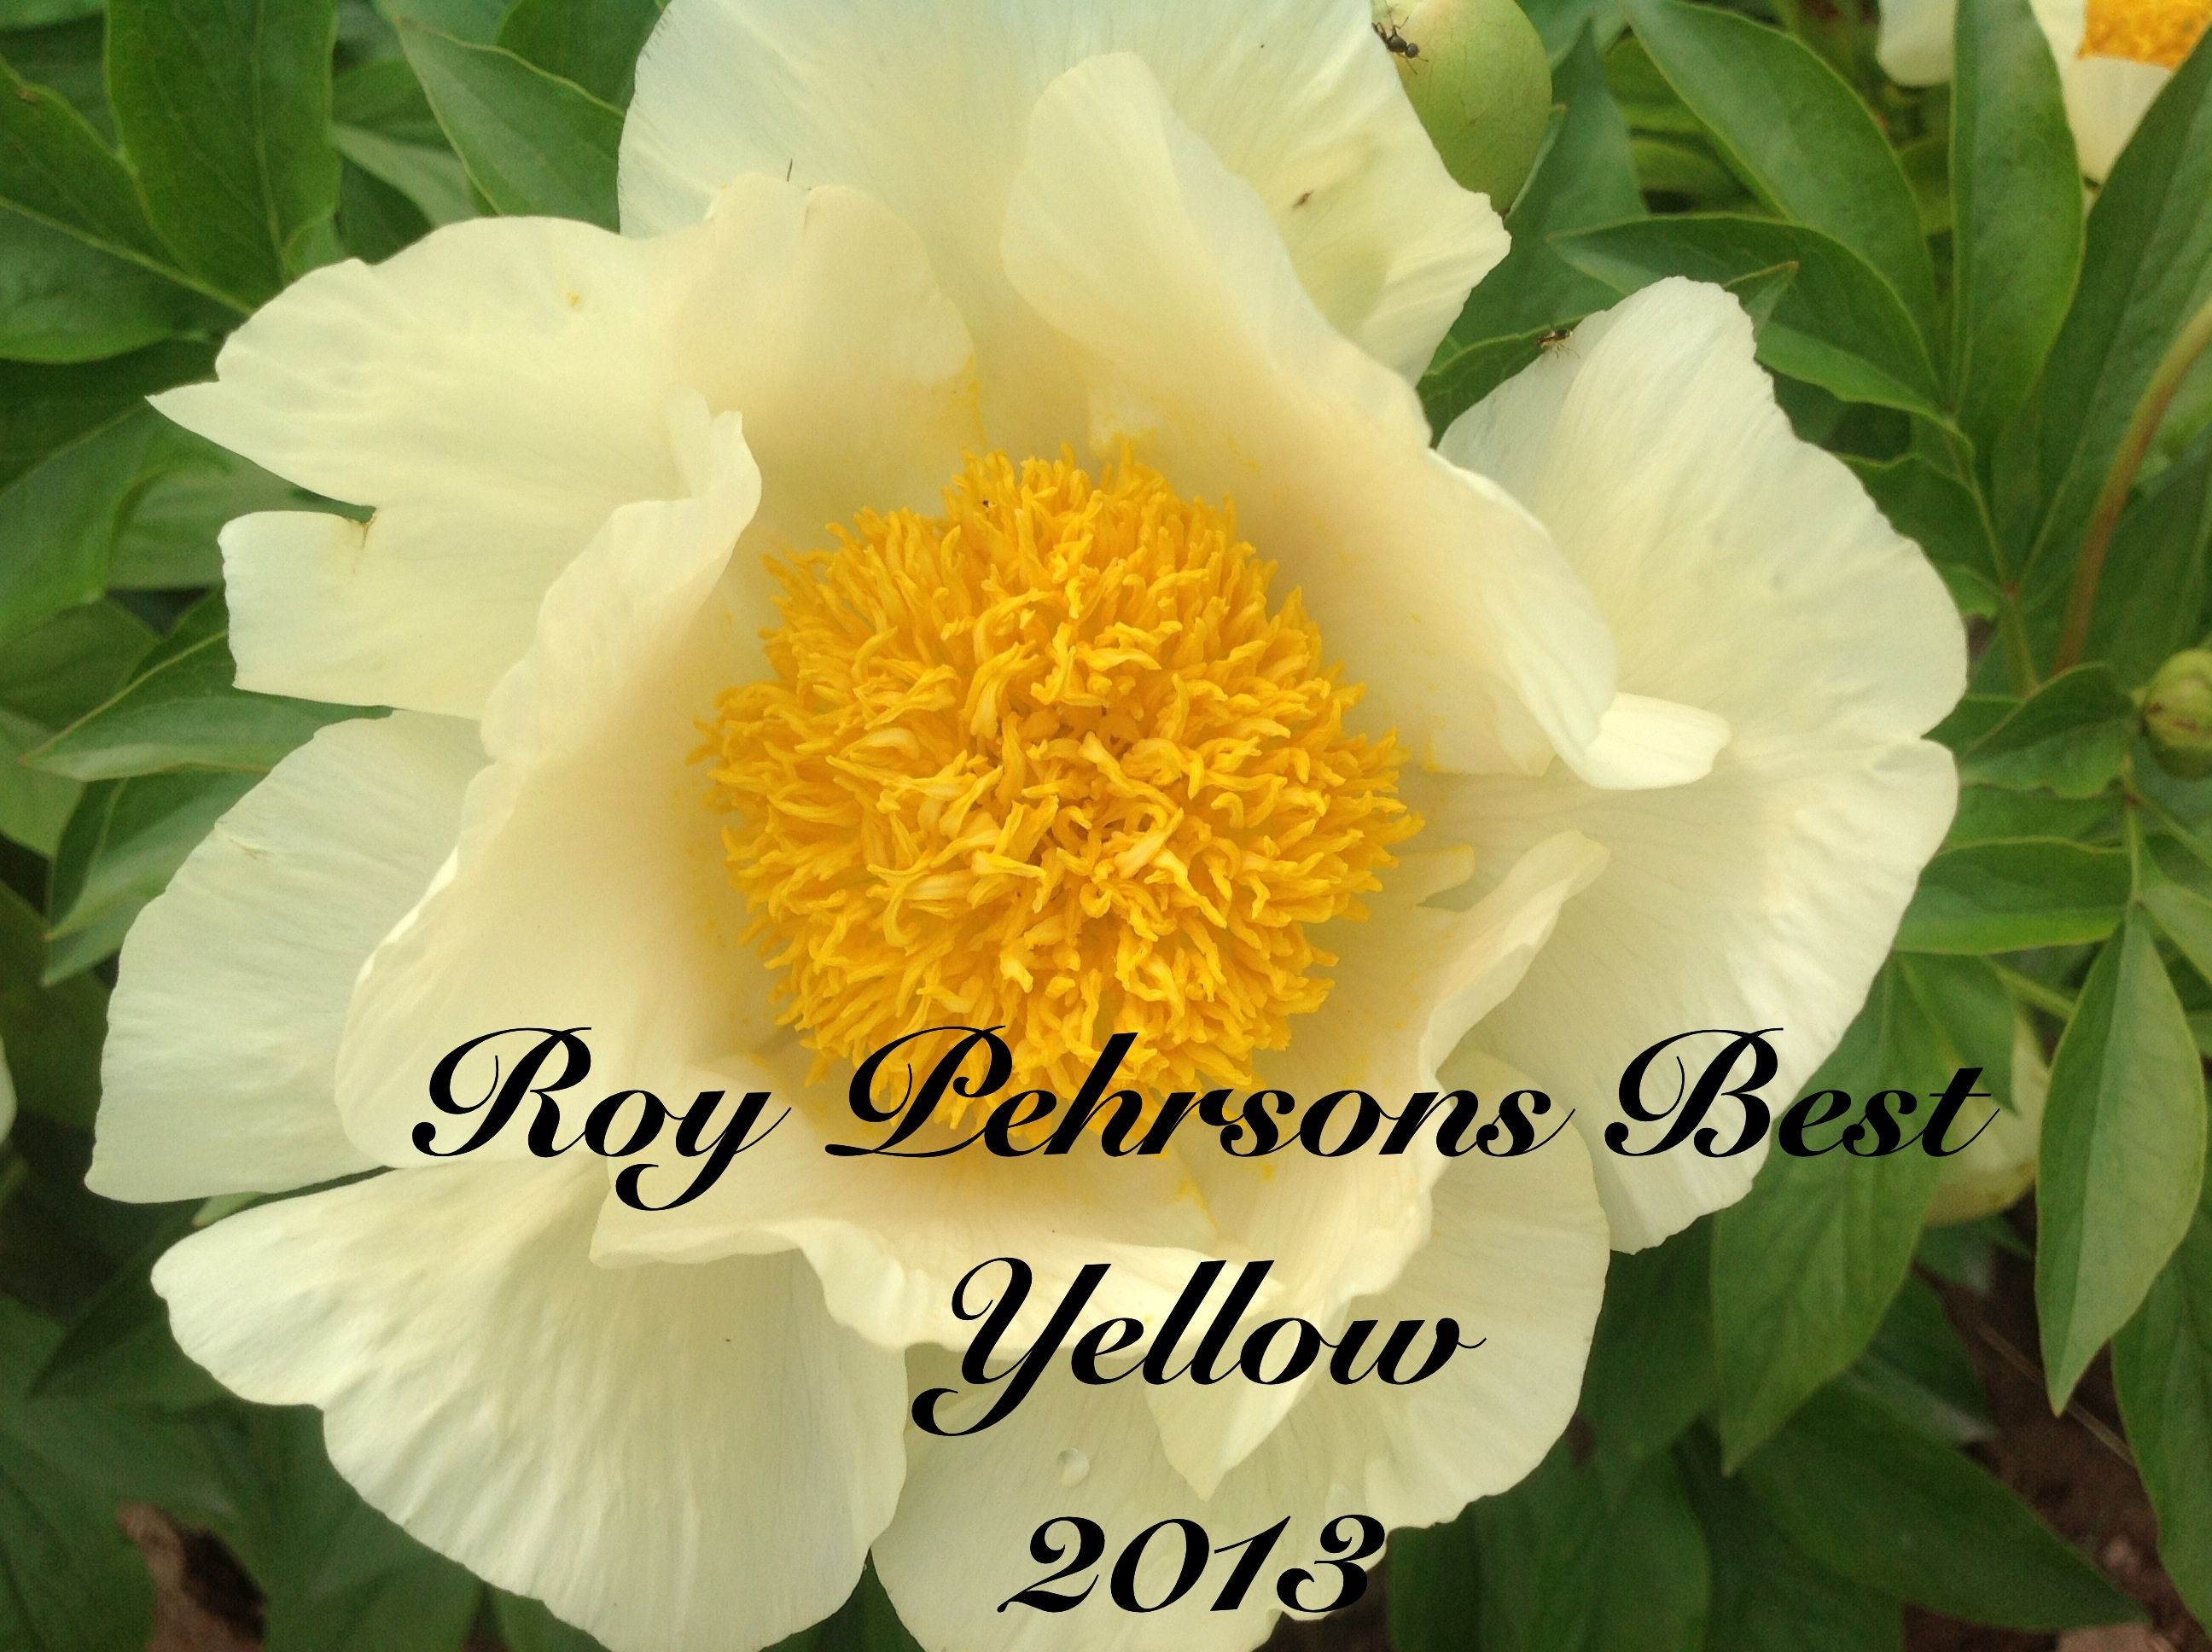 Roy Pehrsons Best Yellow Yellow Peony Flowers Pinterest